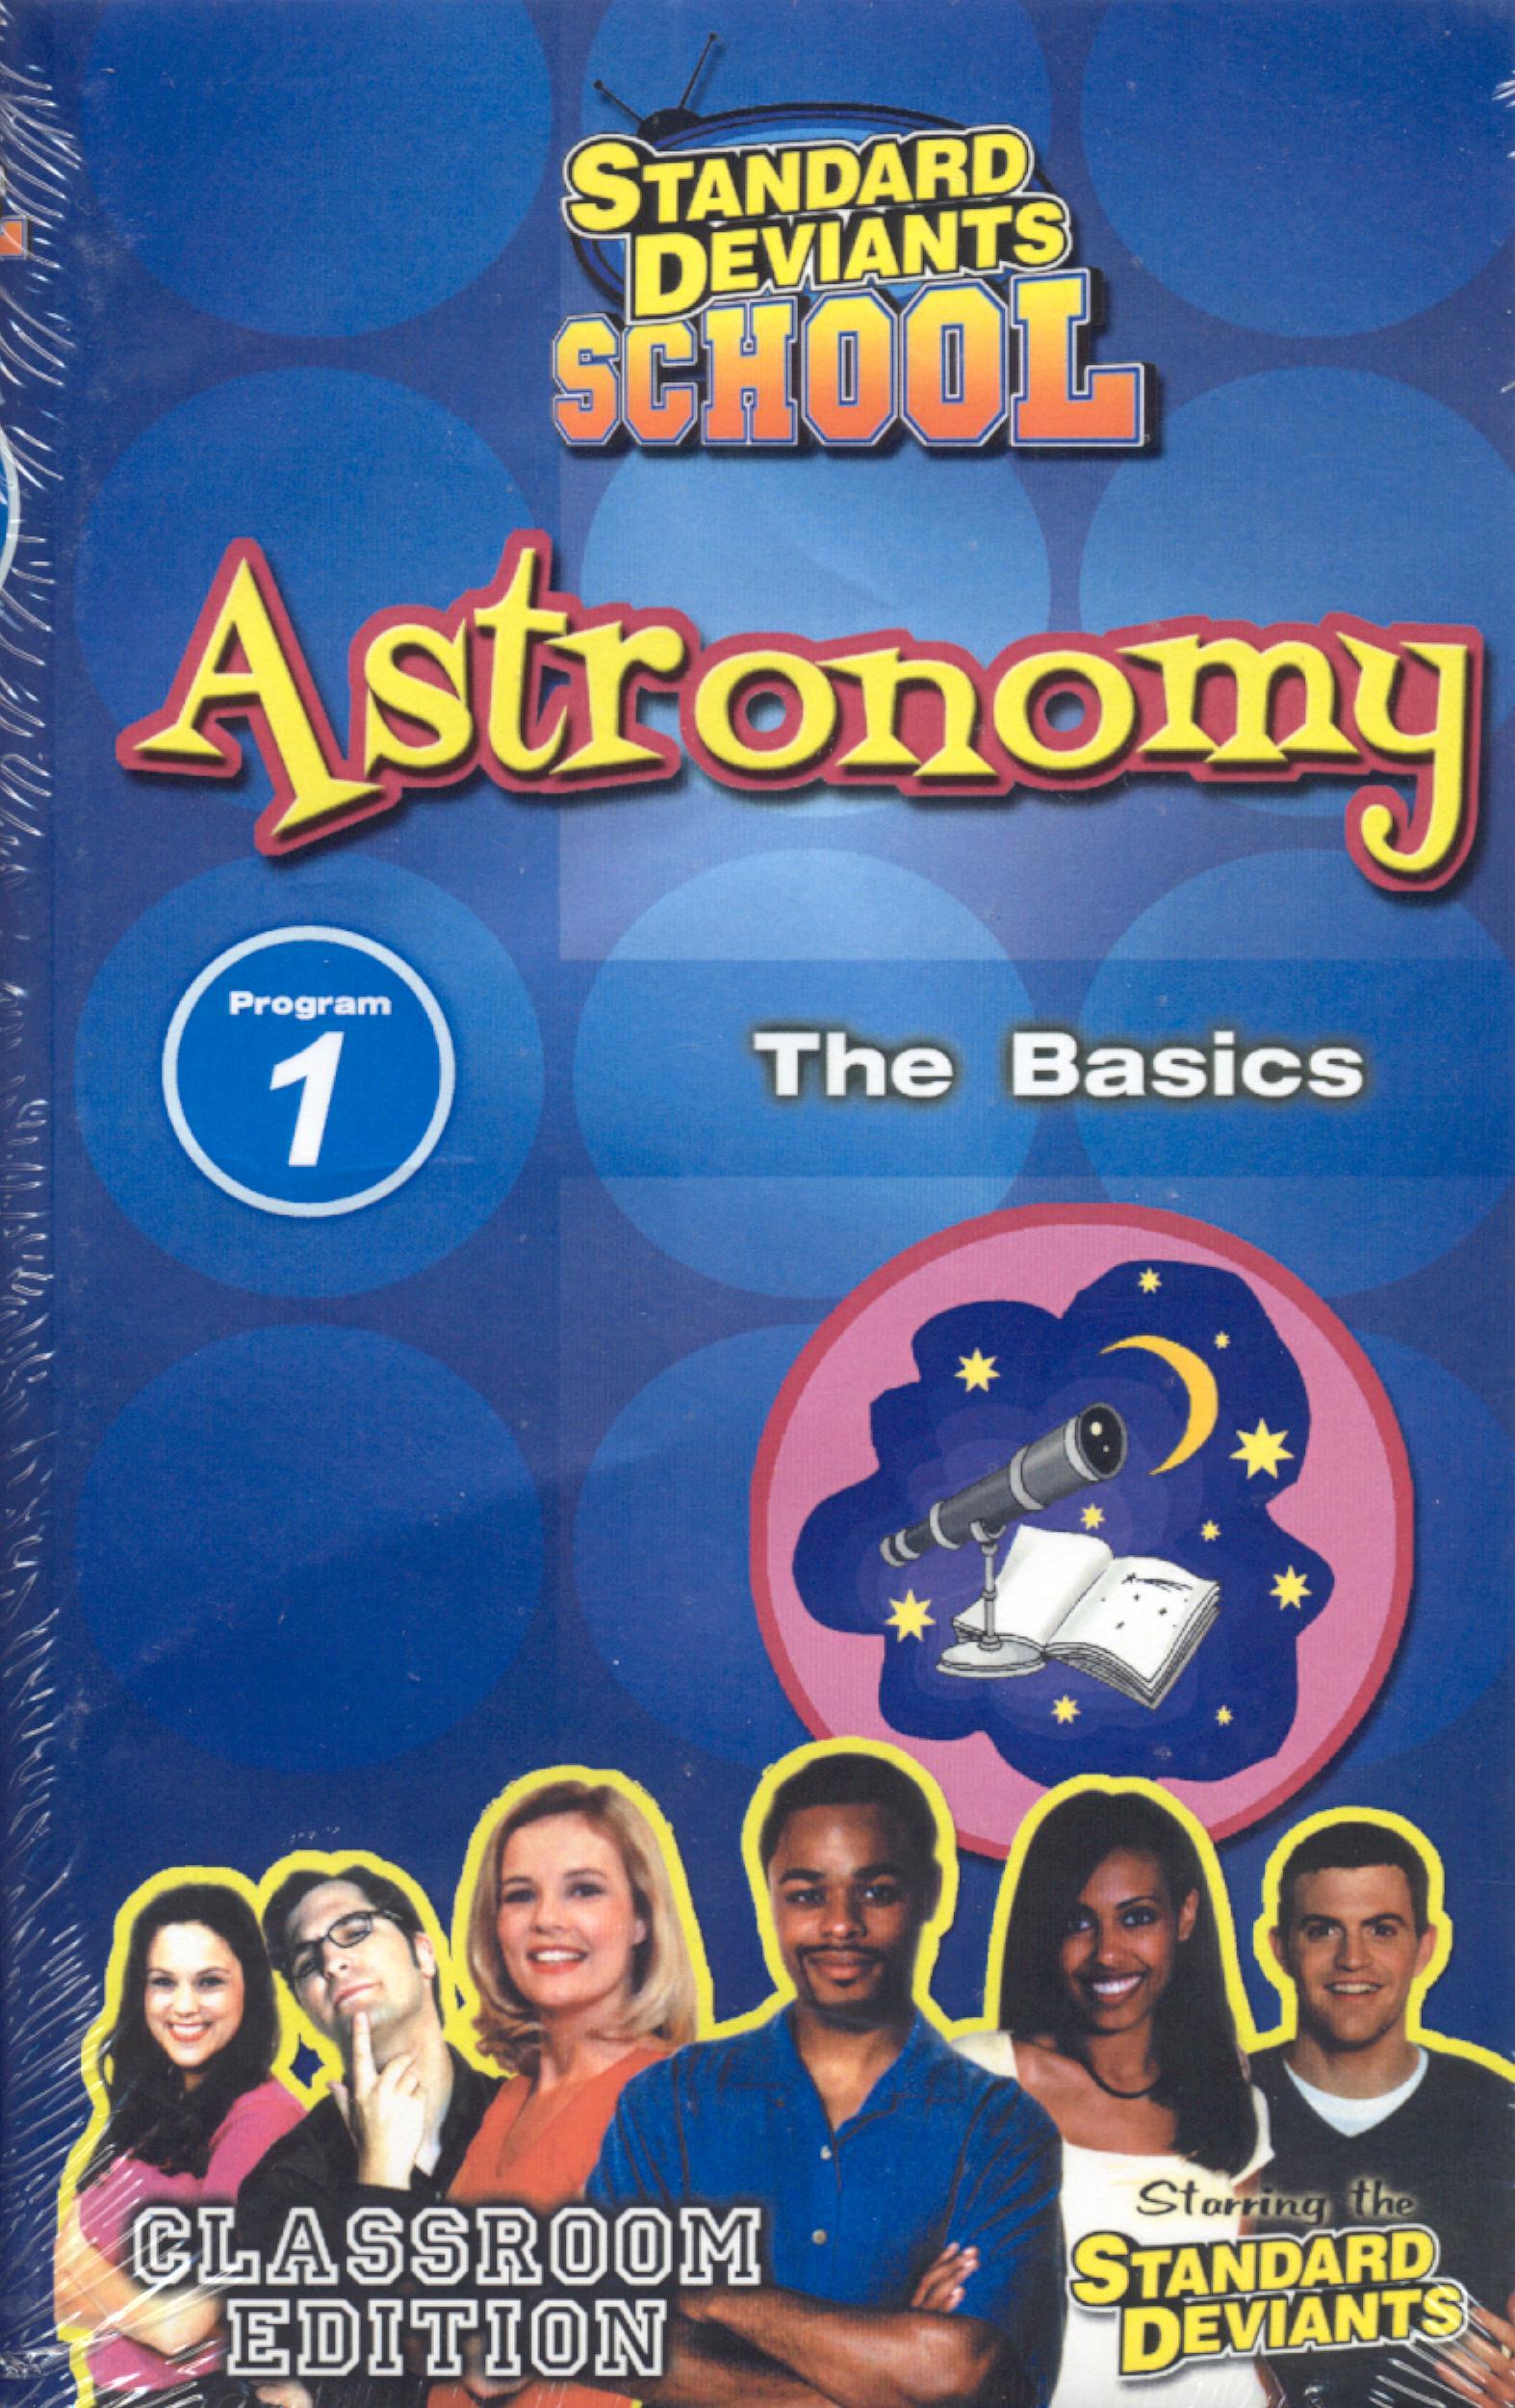 Standard Deviants School: Astronomy, Program 1 - The Basics